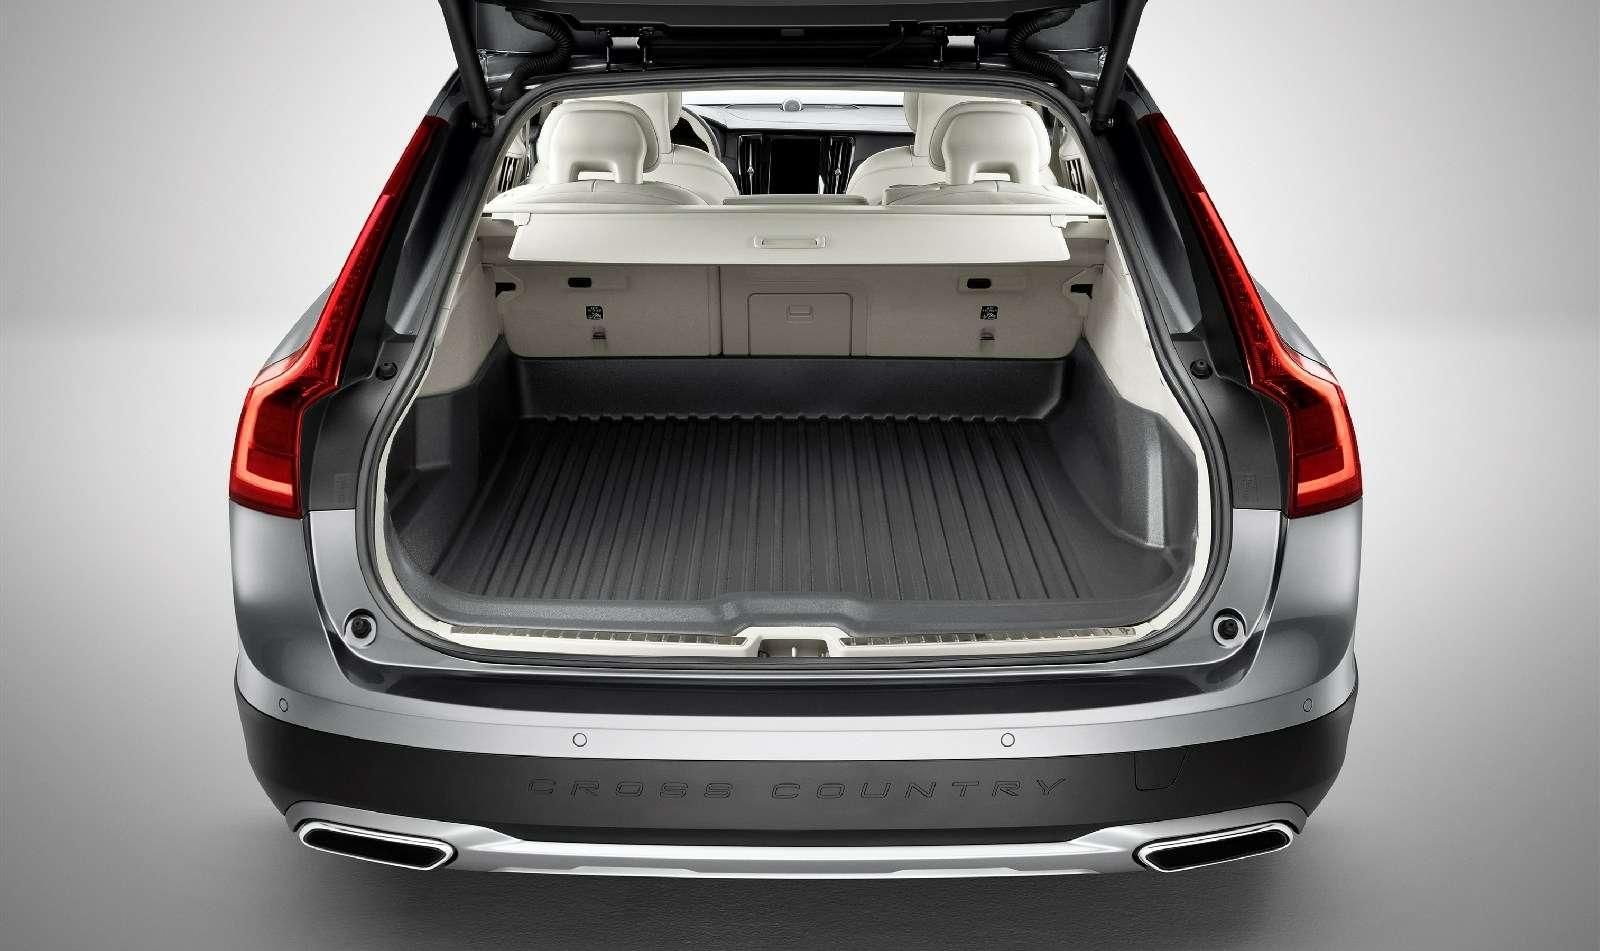 Такой «сарай» нам нужен: Volvo V90 Cross Country представлен официально— фото 635260